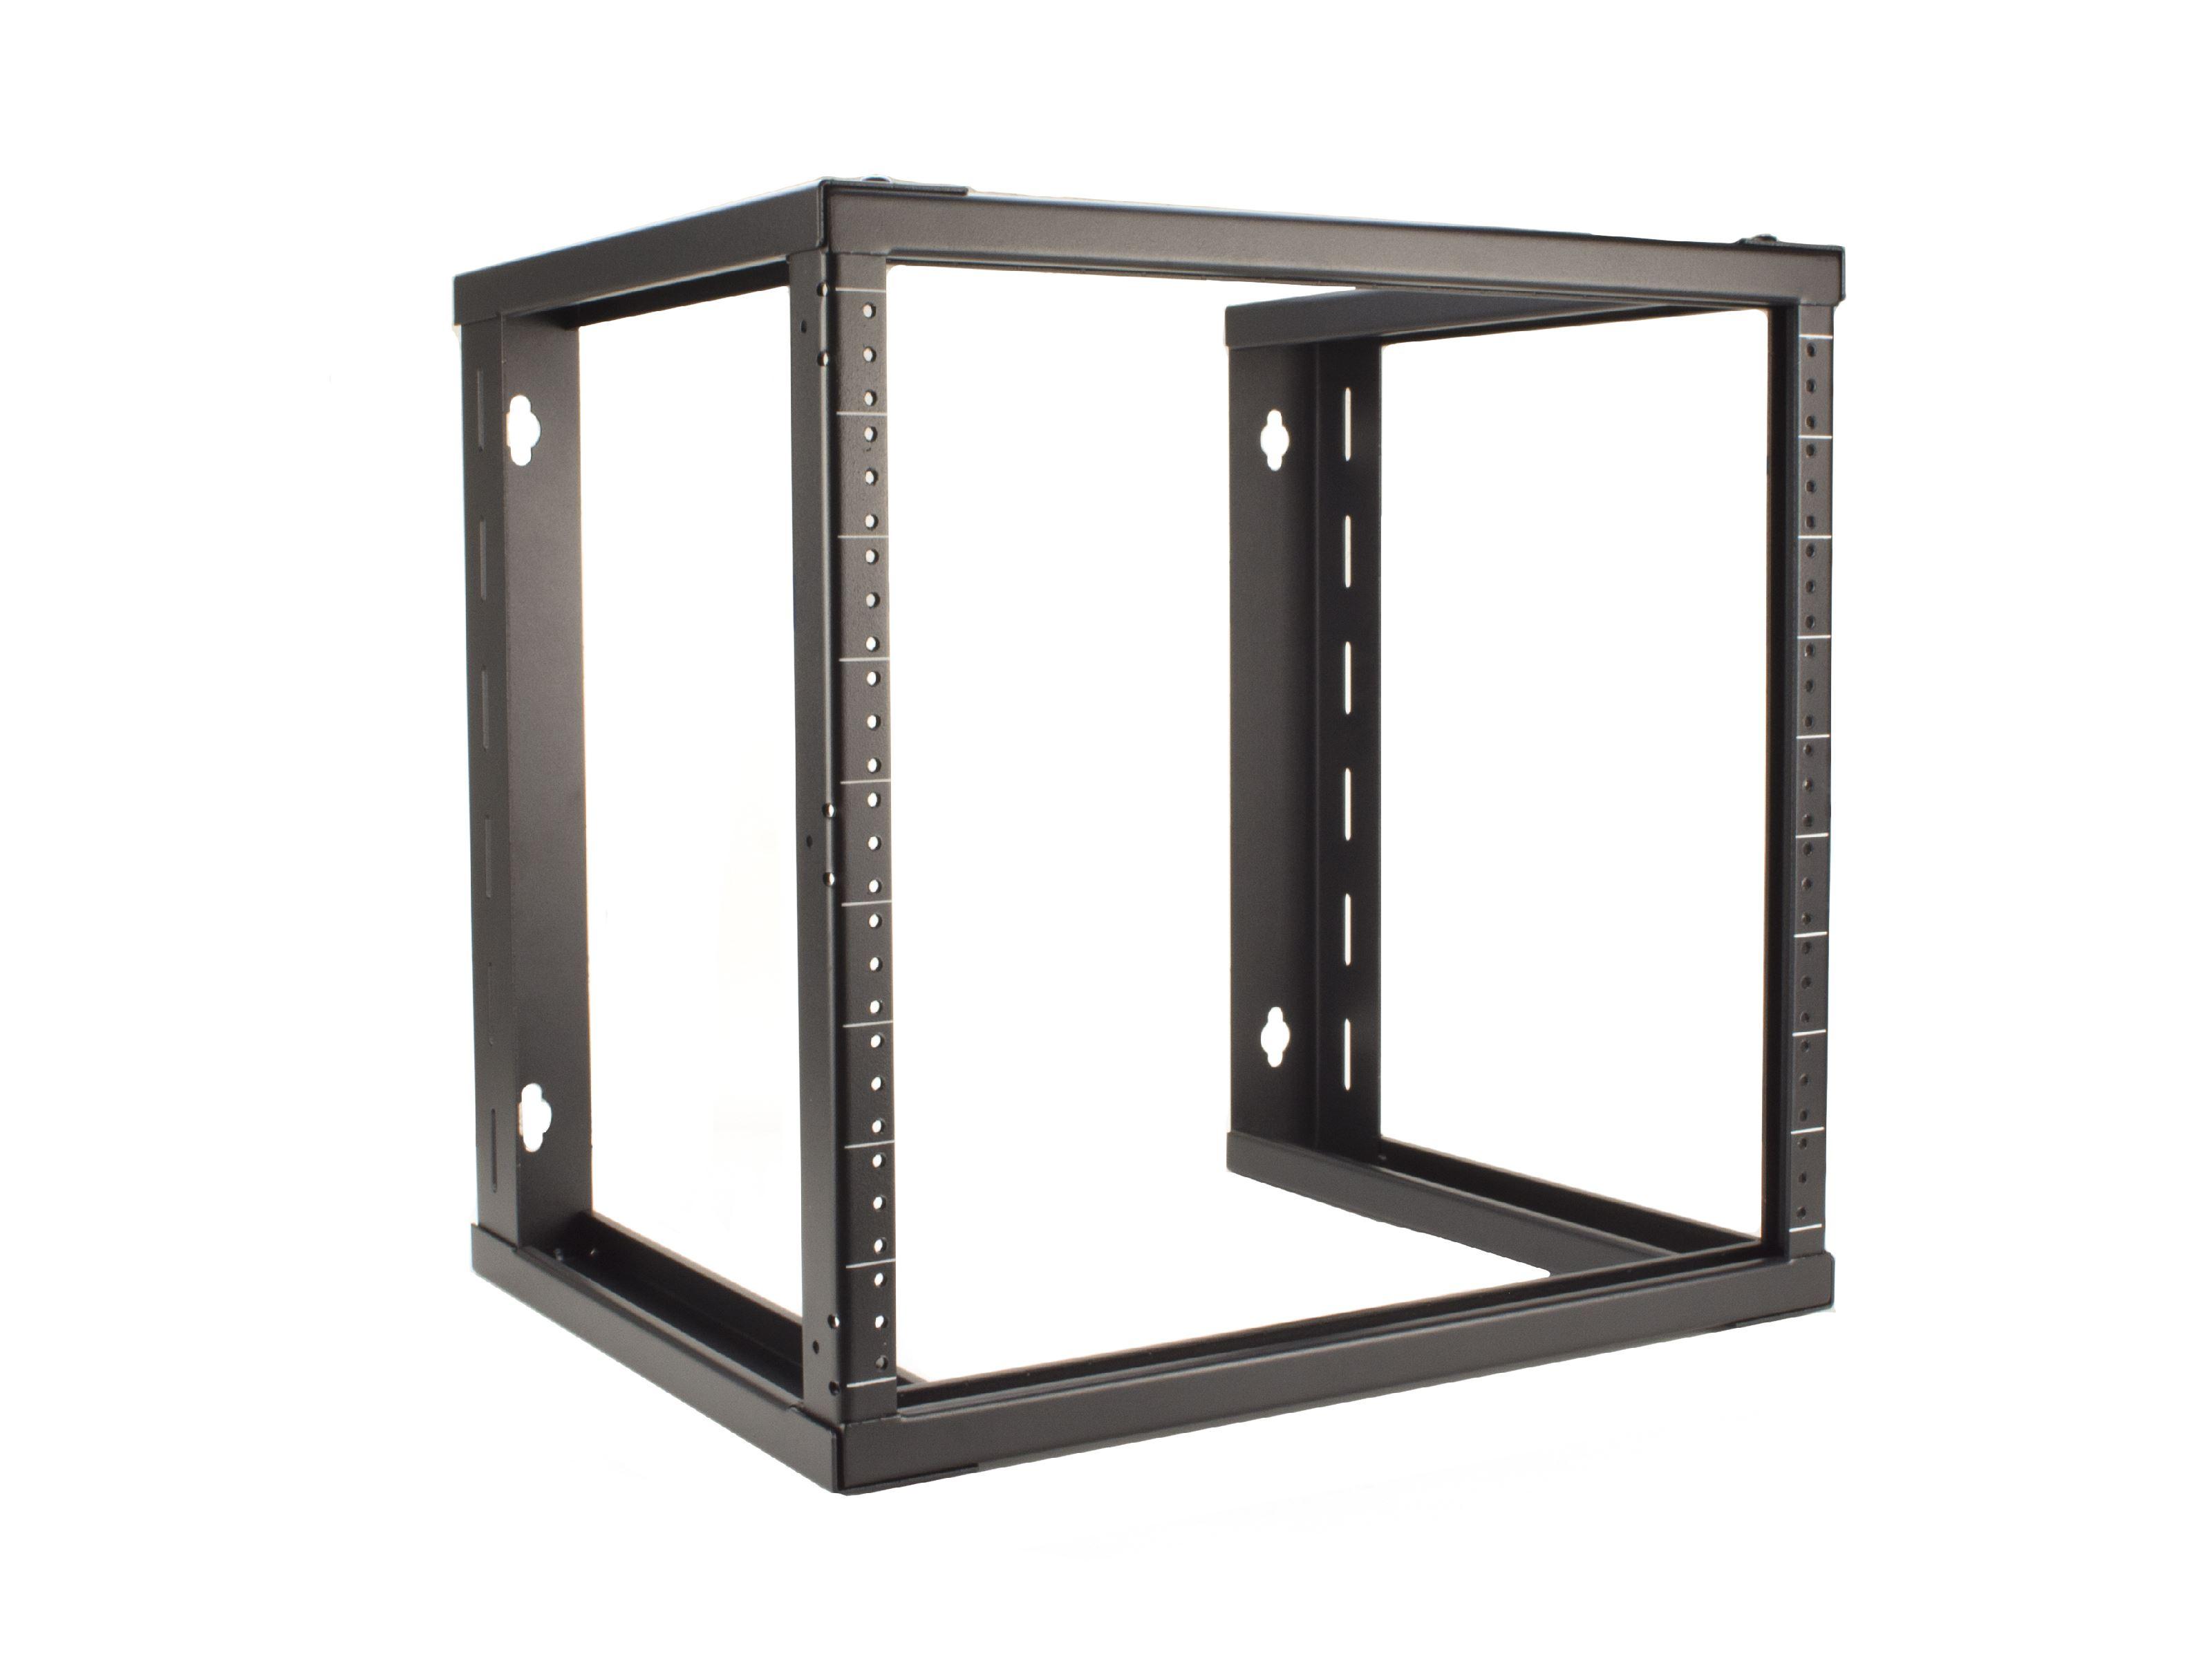 12U Open Frame Wall Mount Rack - 101 Series, 16 Inches Deep, Flat ...